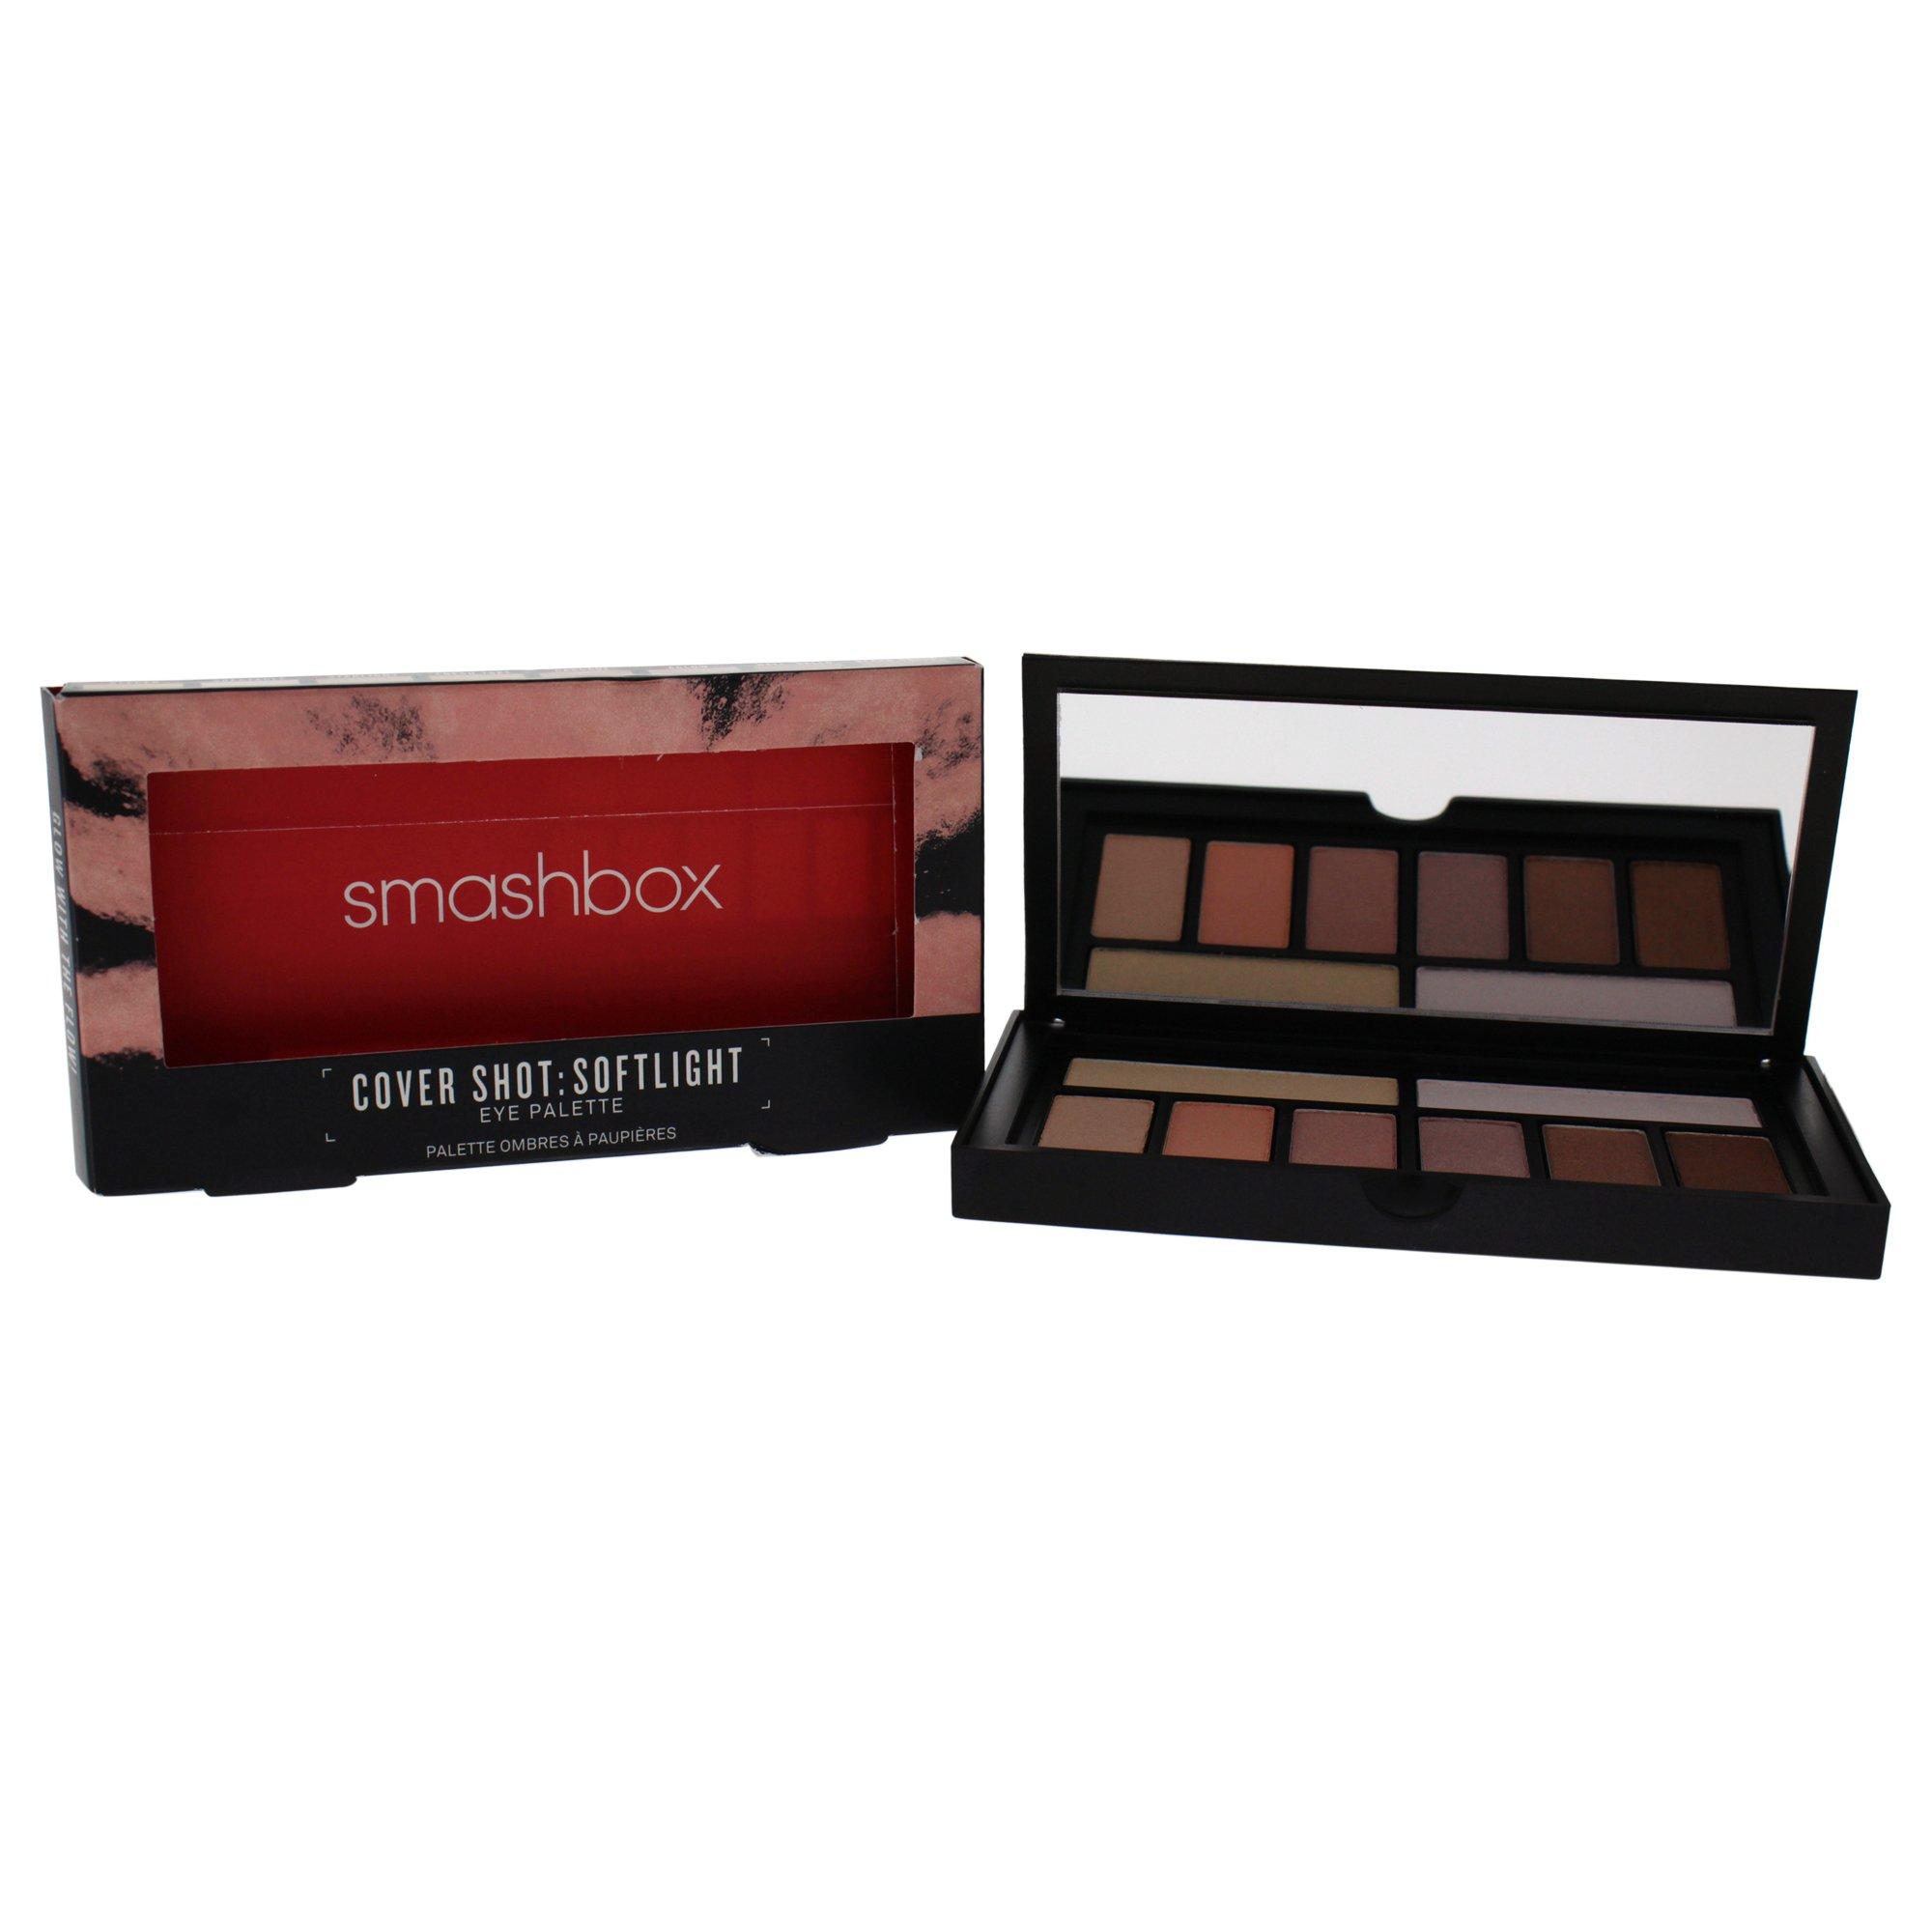 Smashbox Cover Shot Eye Shadow Palette, Softlight, 0.27 Ounce